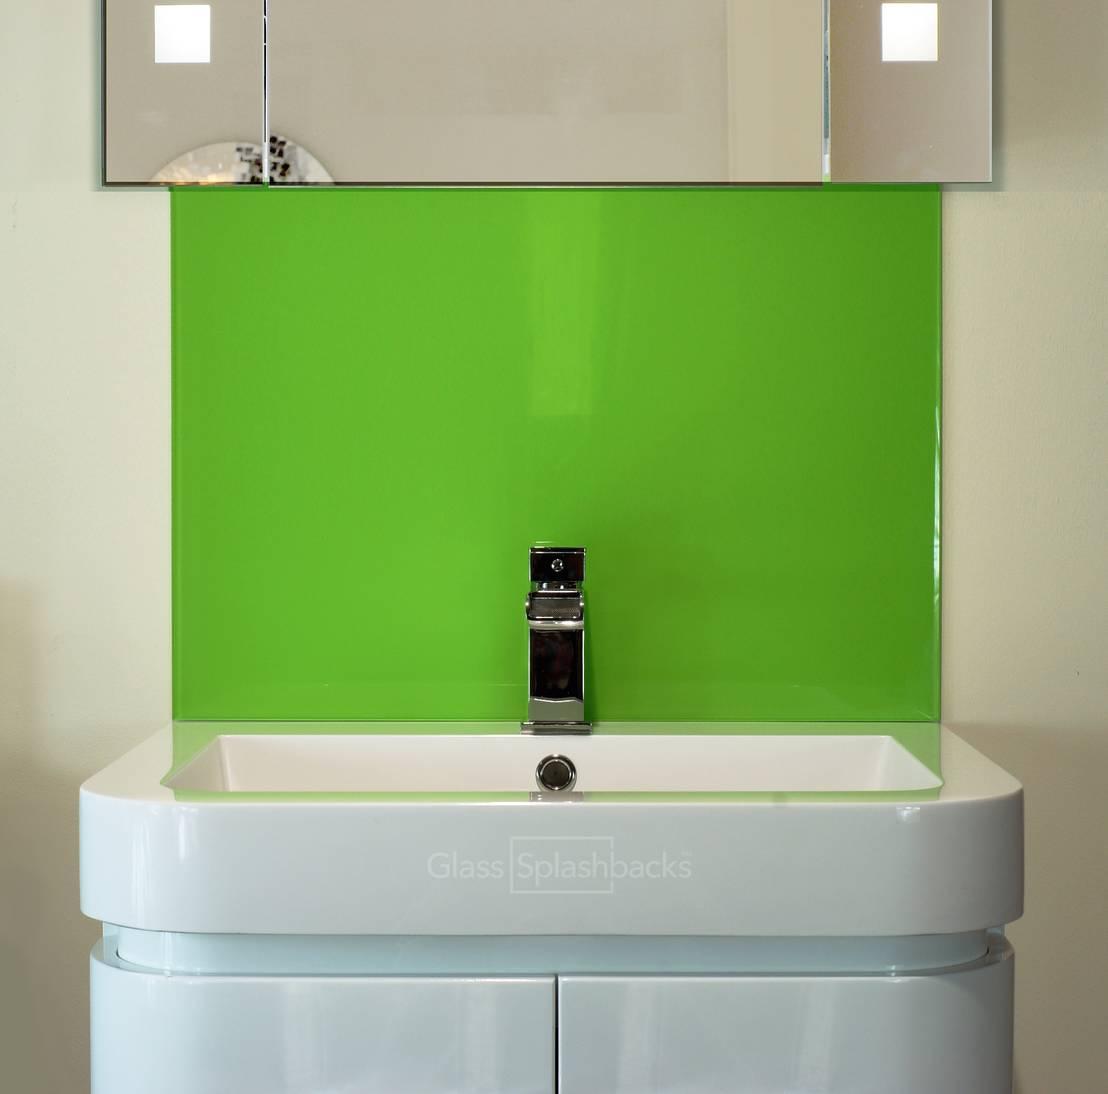 Glass splashbacks for bathroom sinks - Glass Splashbacks For Bathroom Sinks 7